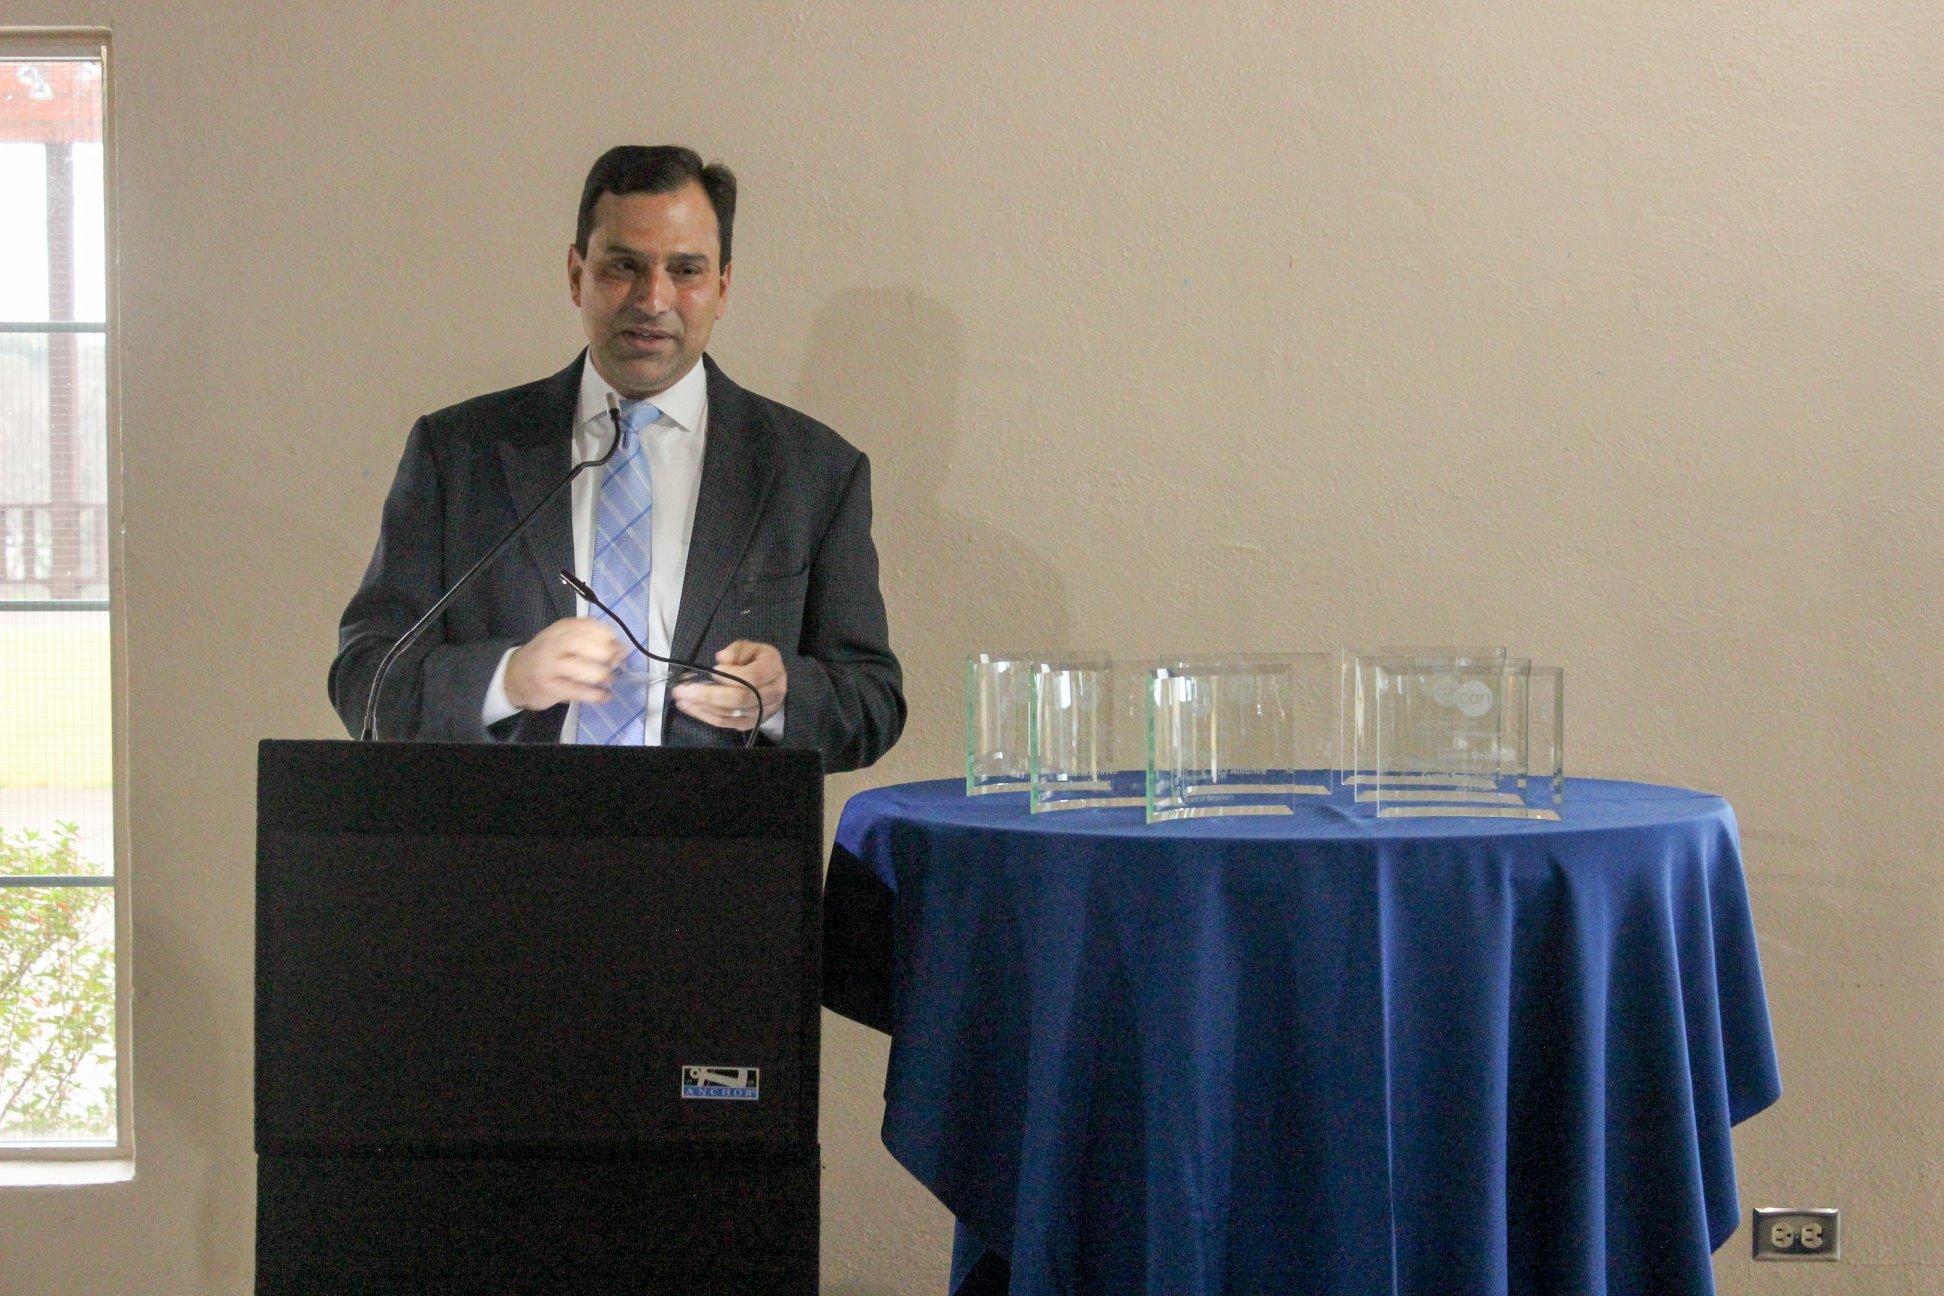 Raul Alvarez, Executive Director of CAN